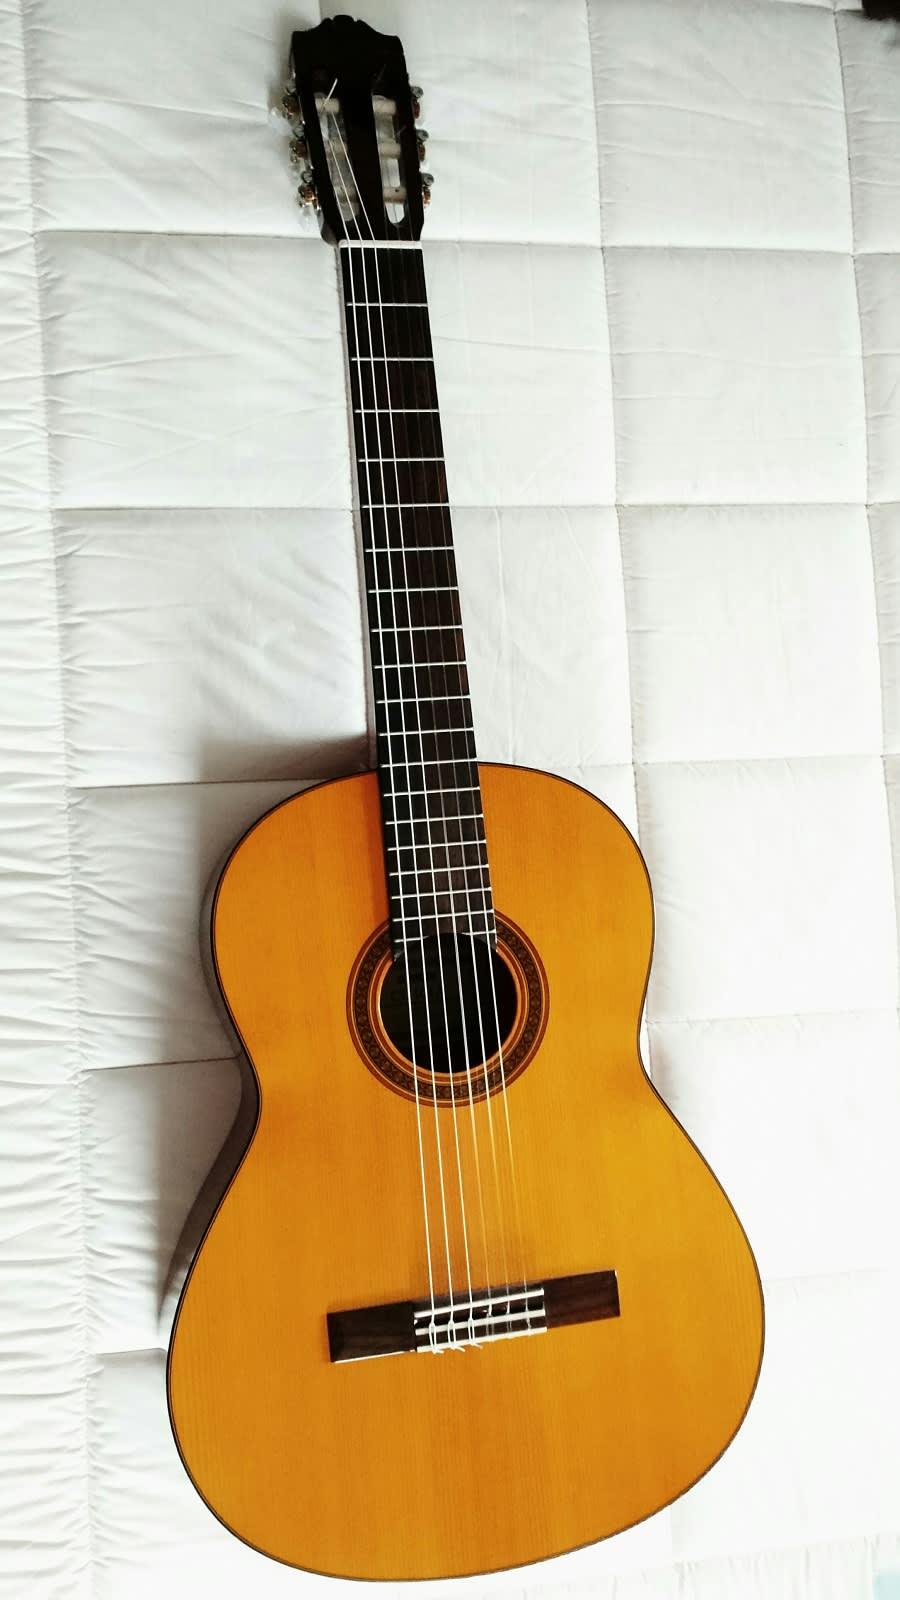 yamaha cg101a classical guitar reverb. Black Bedroom Furniture Sets. Home Design Ideas